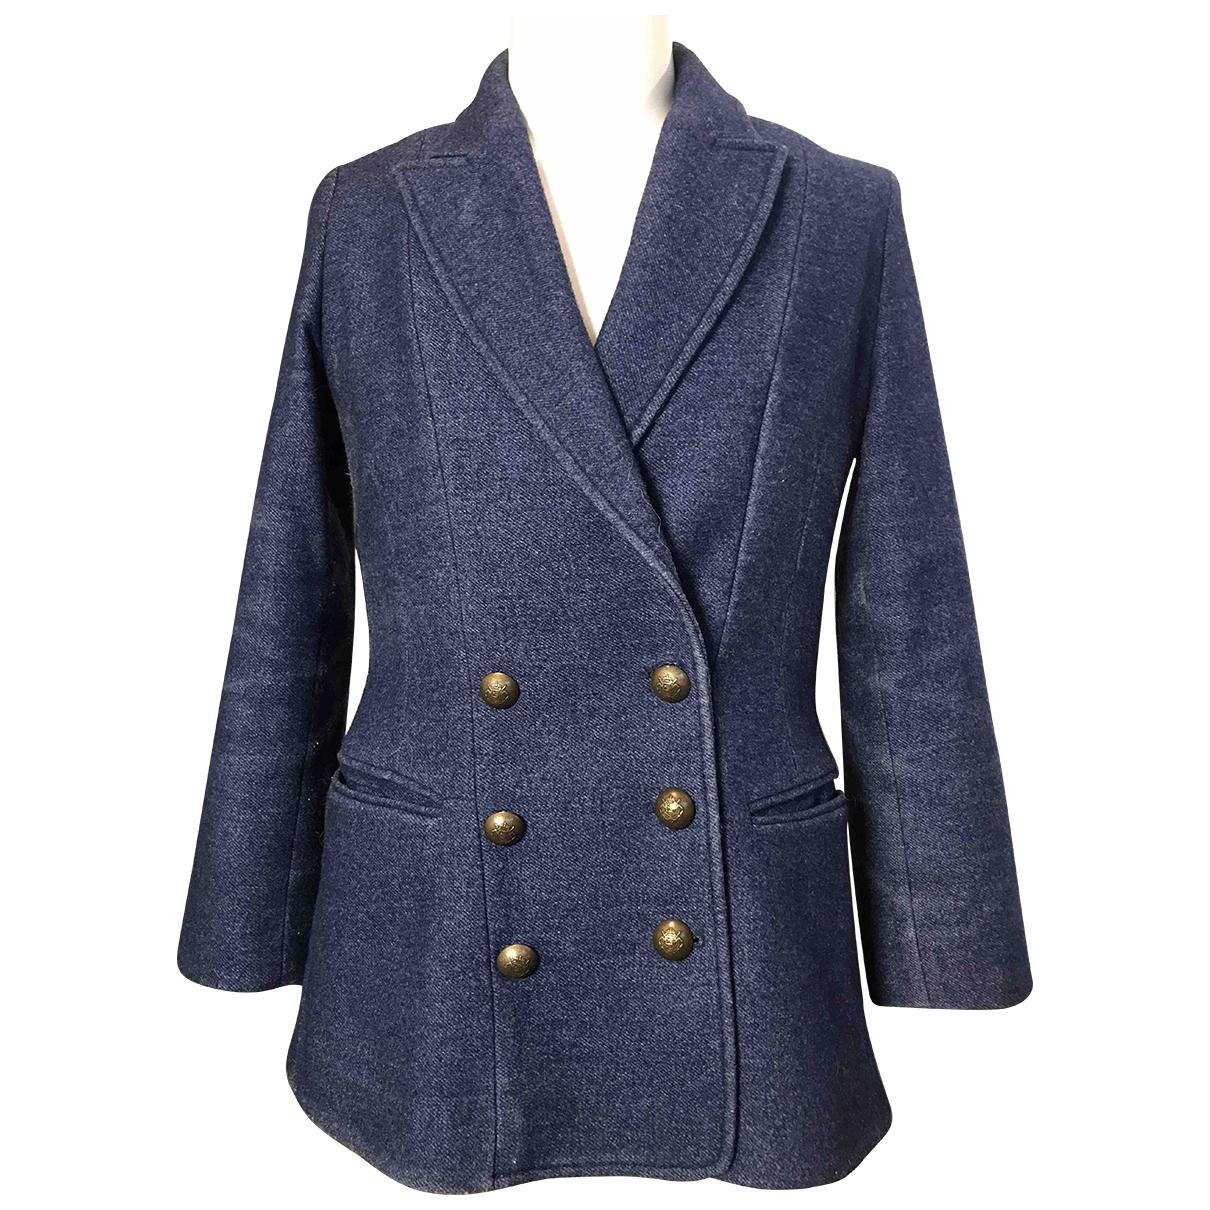 7 For All Mankind \N Blue Wool jacket for Women L International